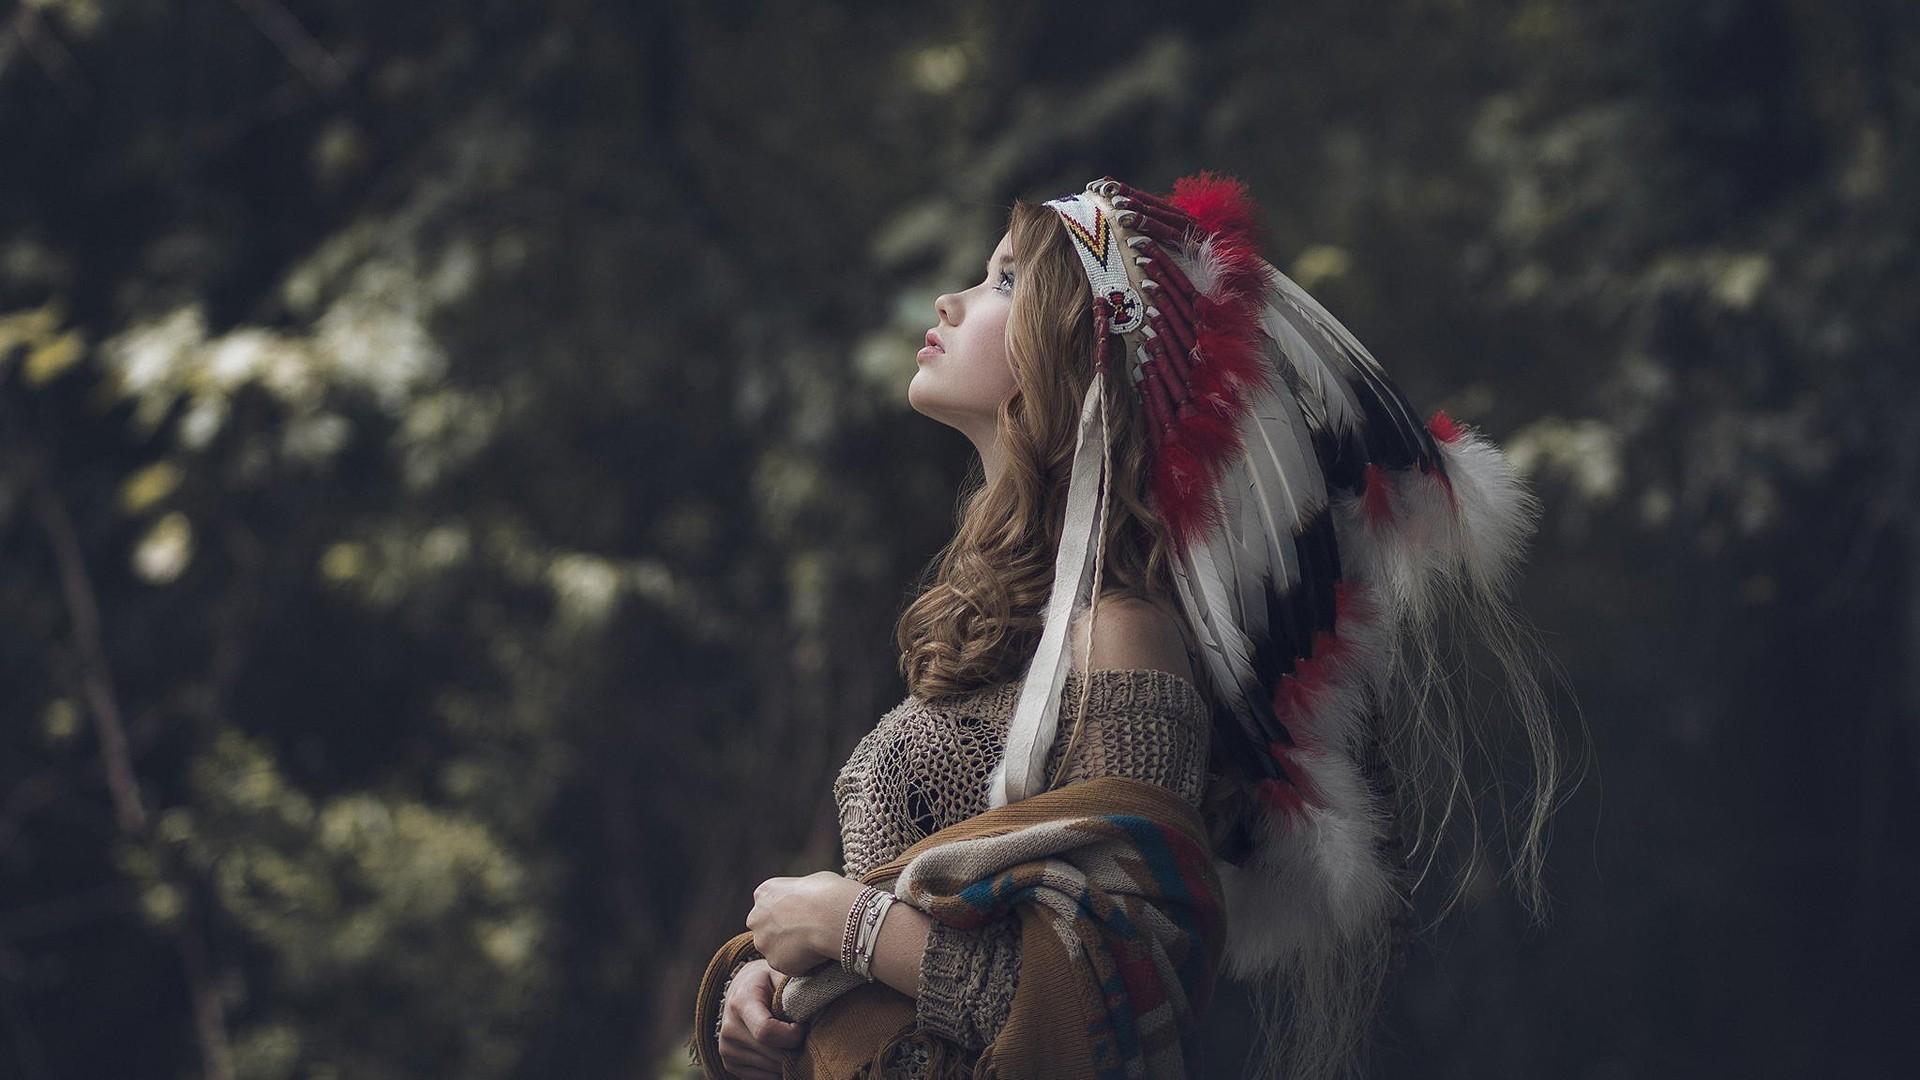 … wallpapers native american wallpaper; native american brunettes nature  headdress walldevil …